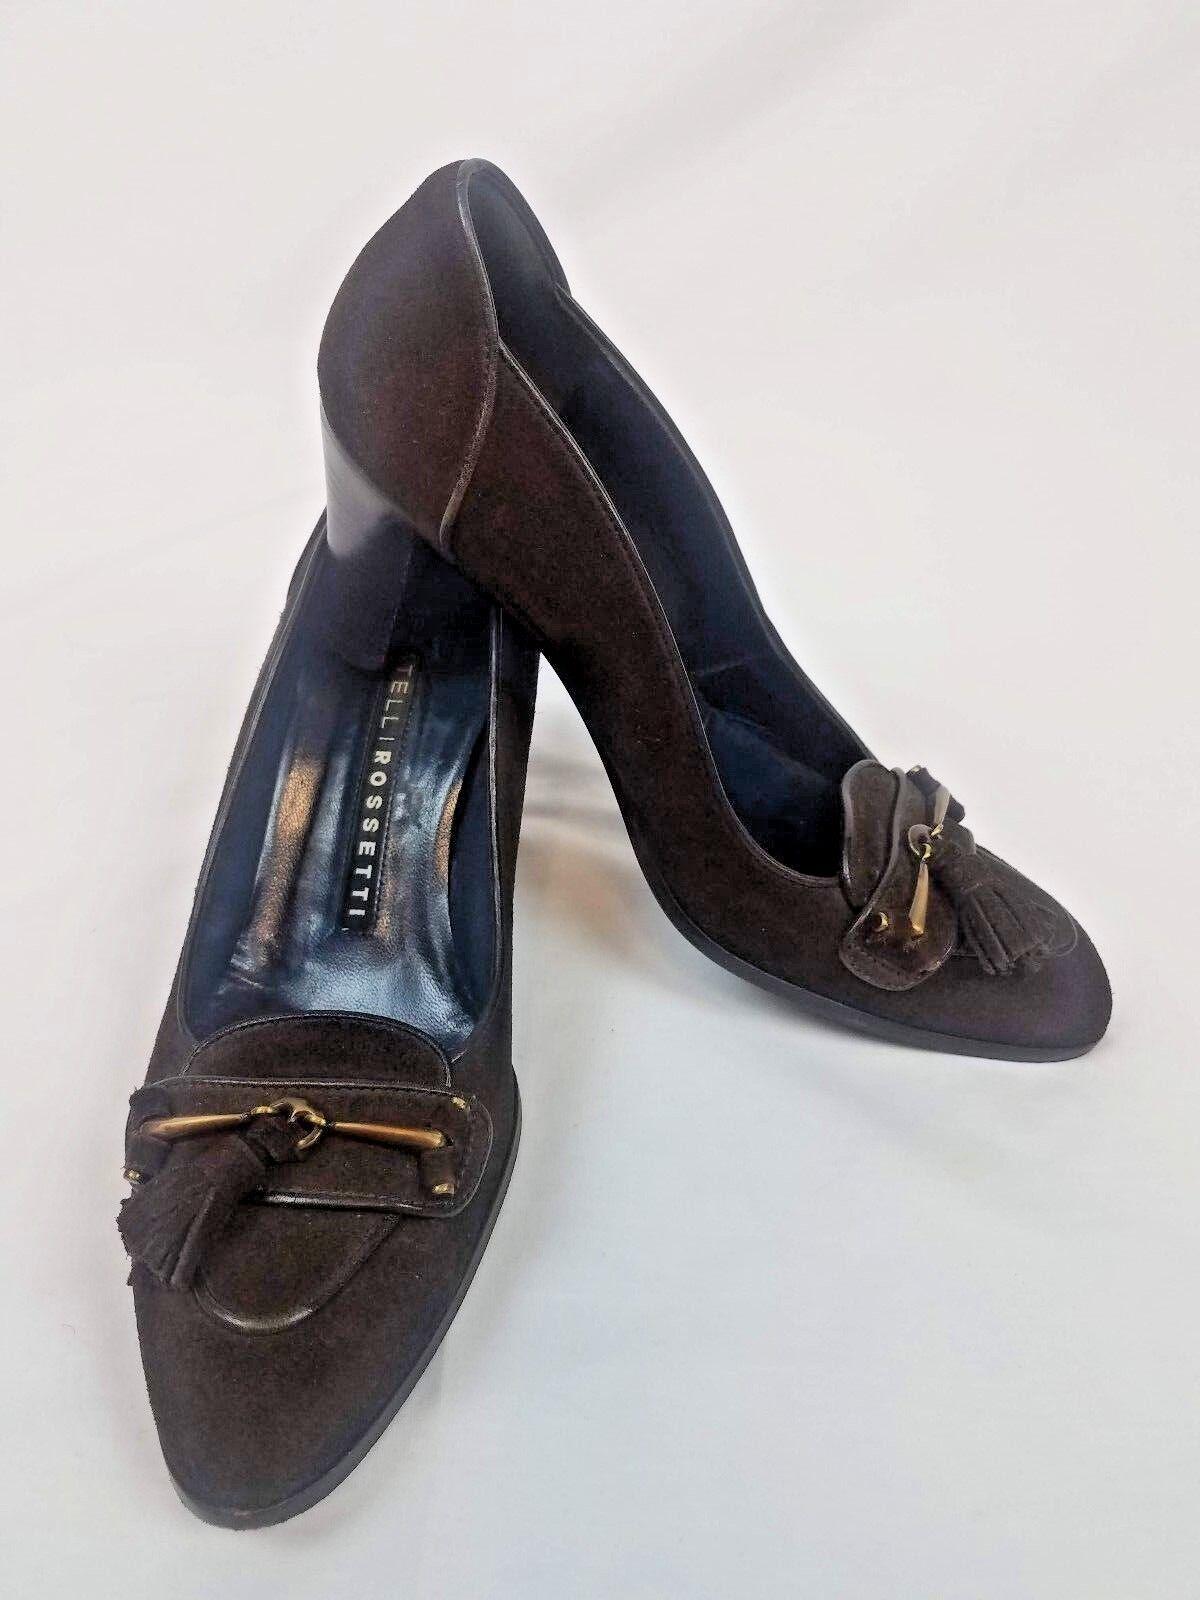 alto sconto Fratelli rosatti Marrone Leather Horsebit Tassle Tassle Tassle High Heel Pumps donna Sz US 7  acquista marca